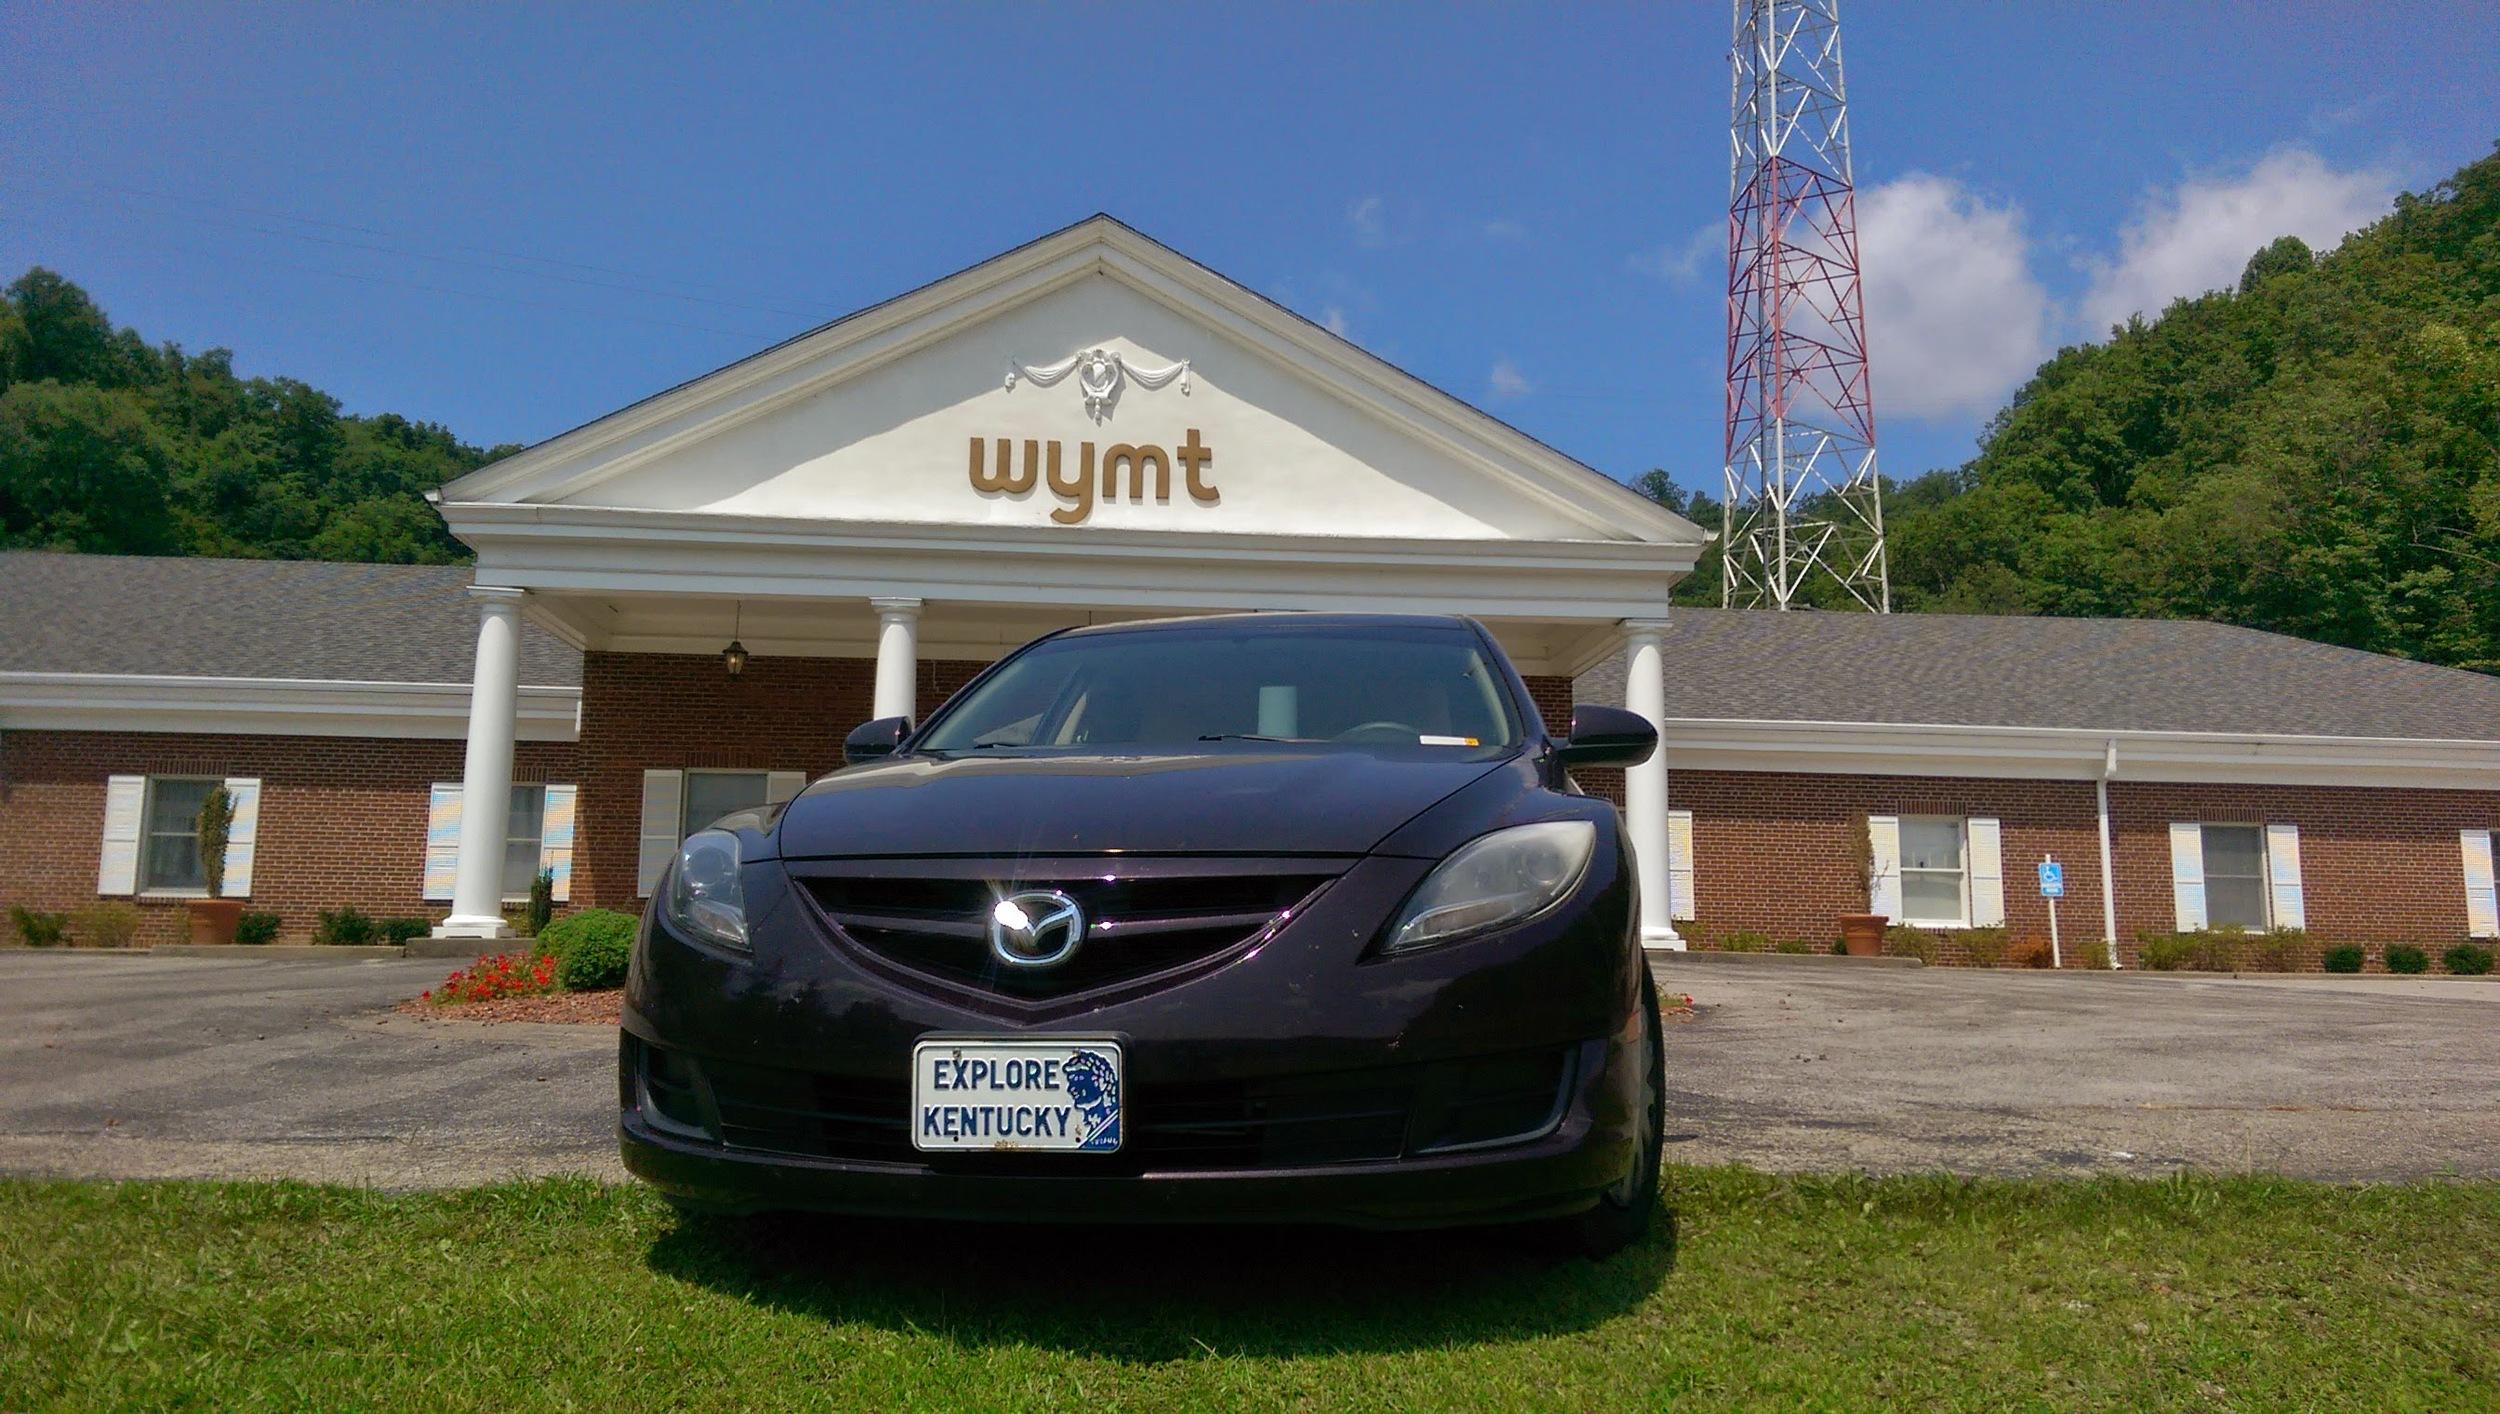 The Explore Kentucky Land Cruiser at WYMT-TV in Hazard, KY Photo by: Gerry Seavo